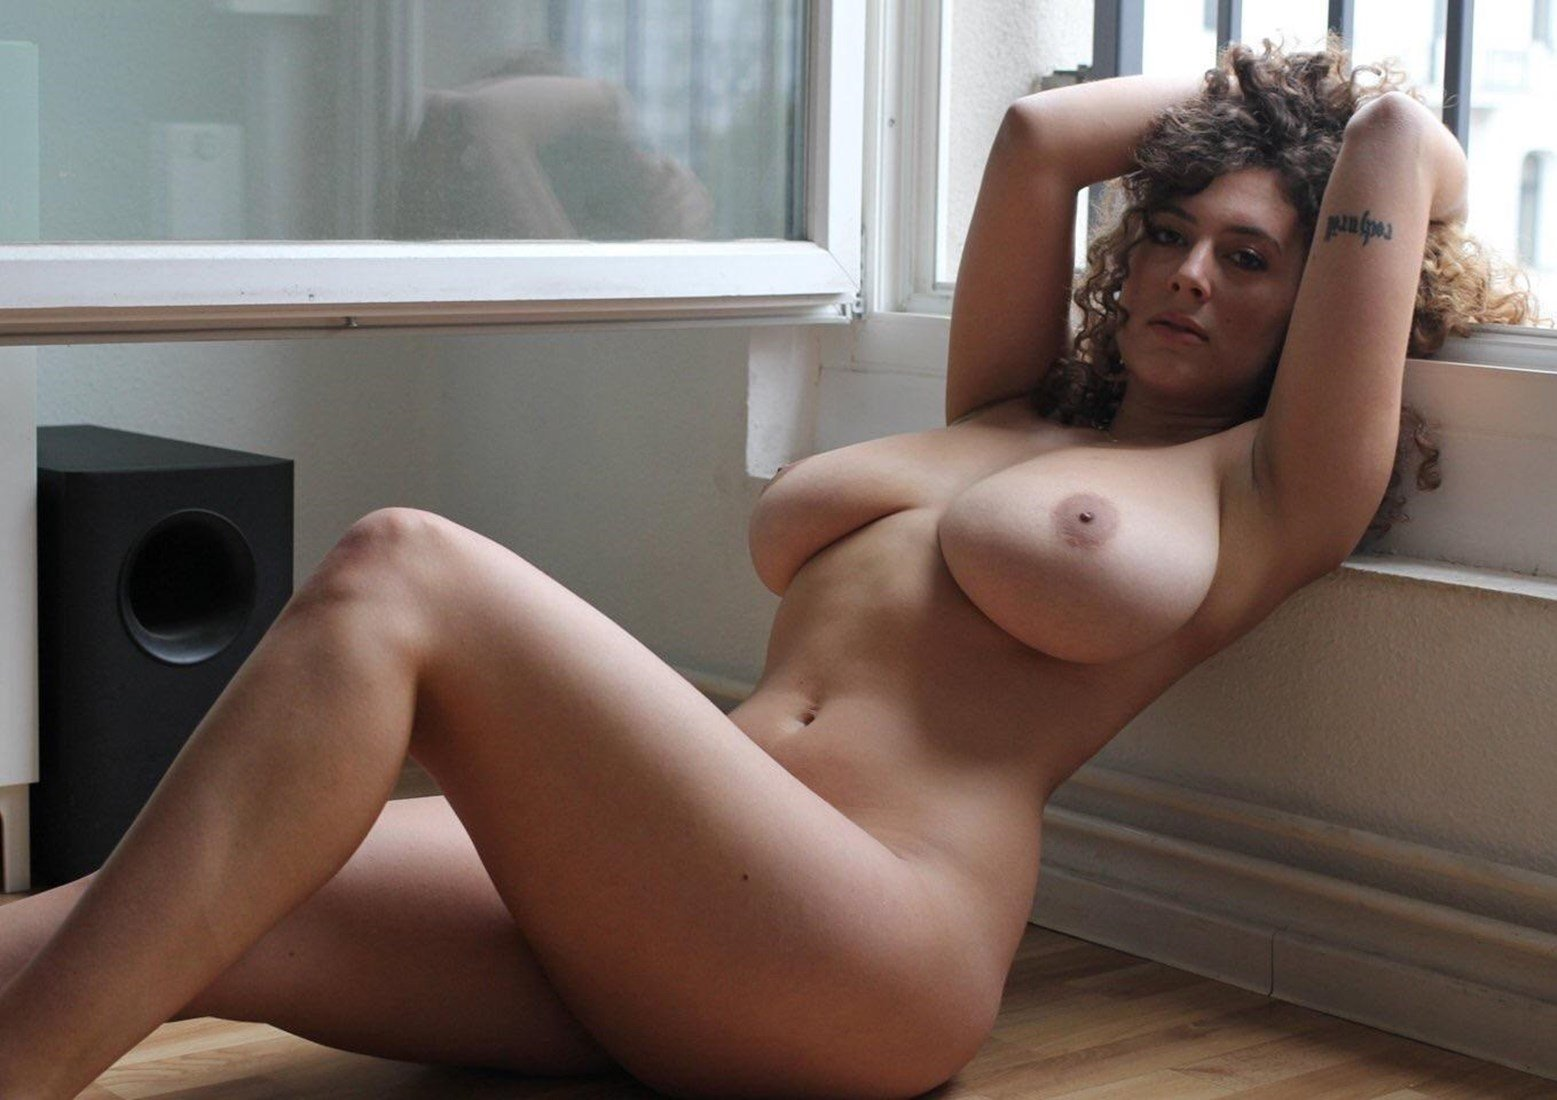 Leila Lowfire Nude Photos Collection